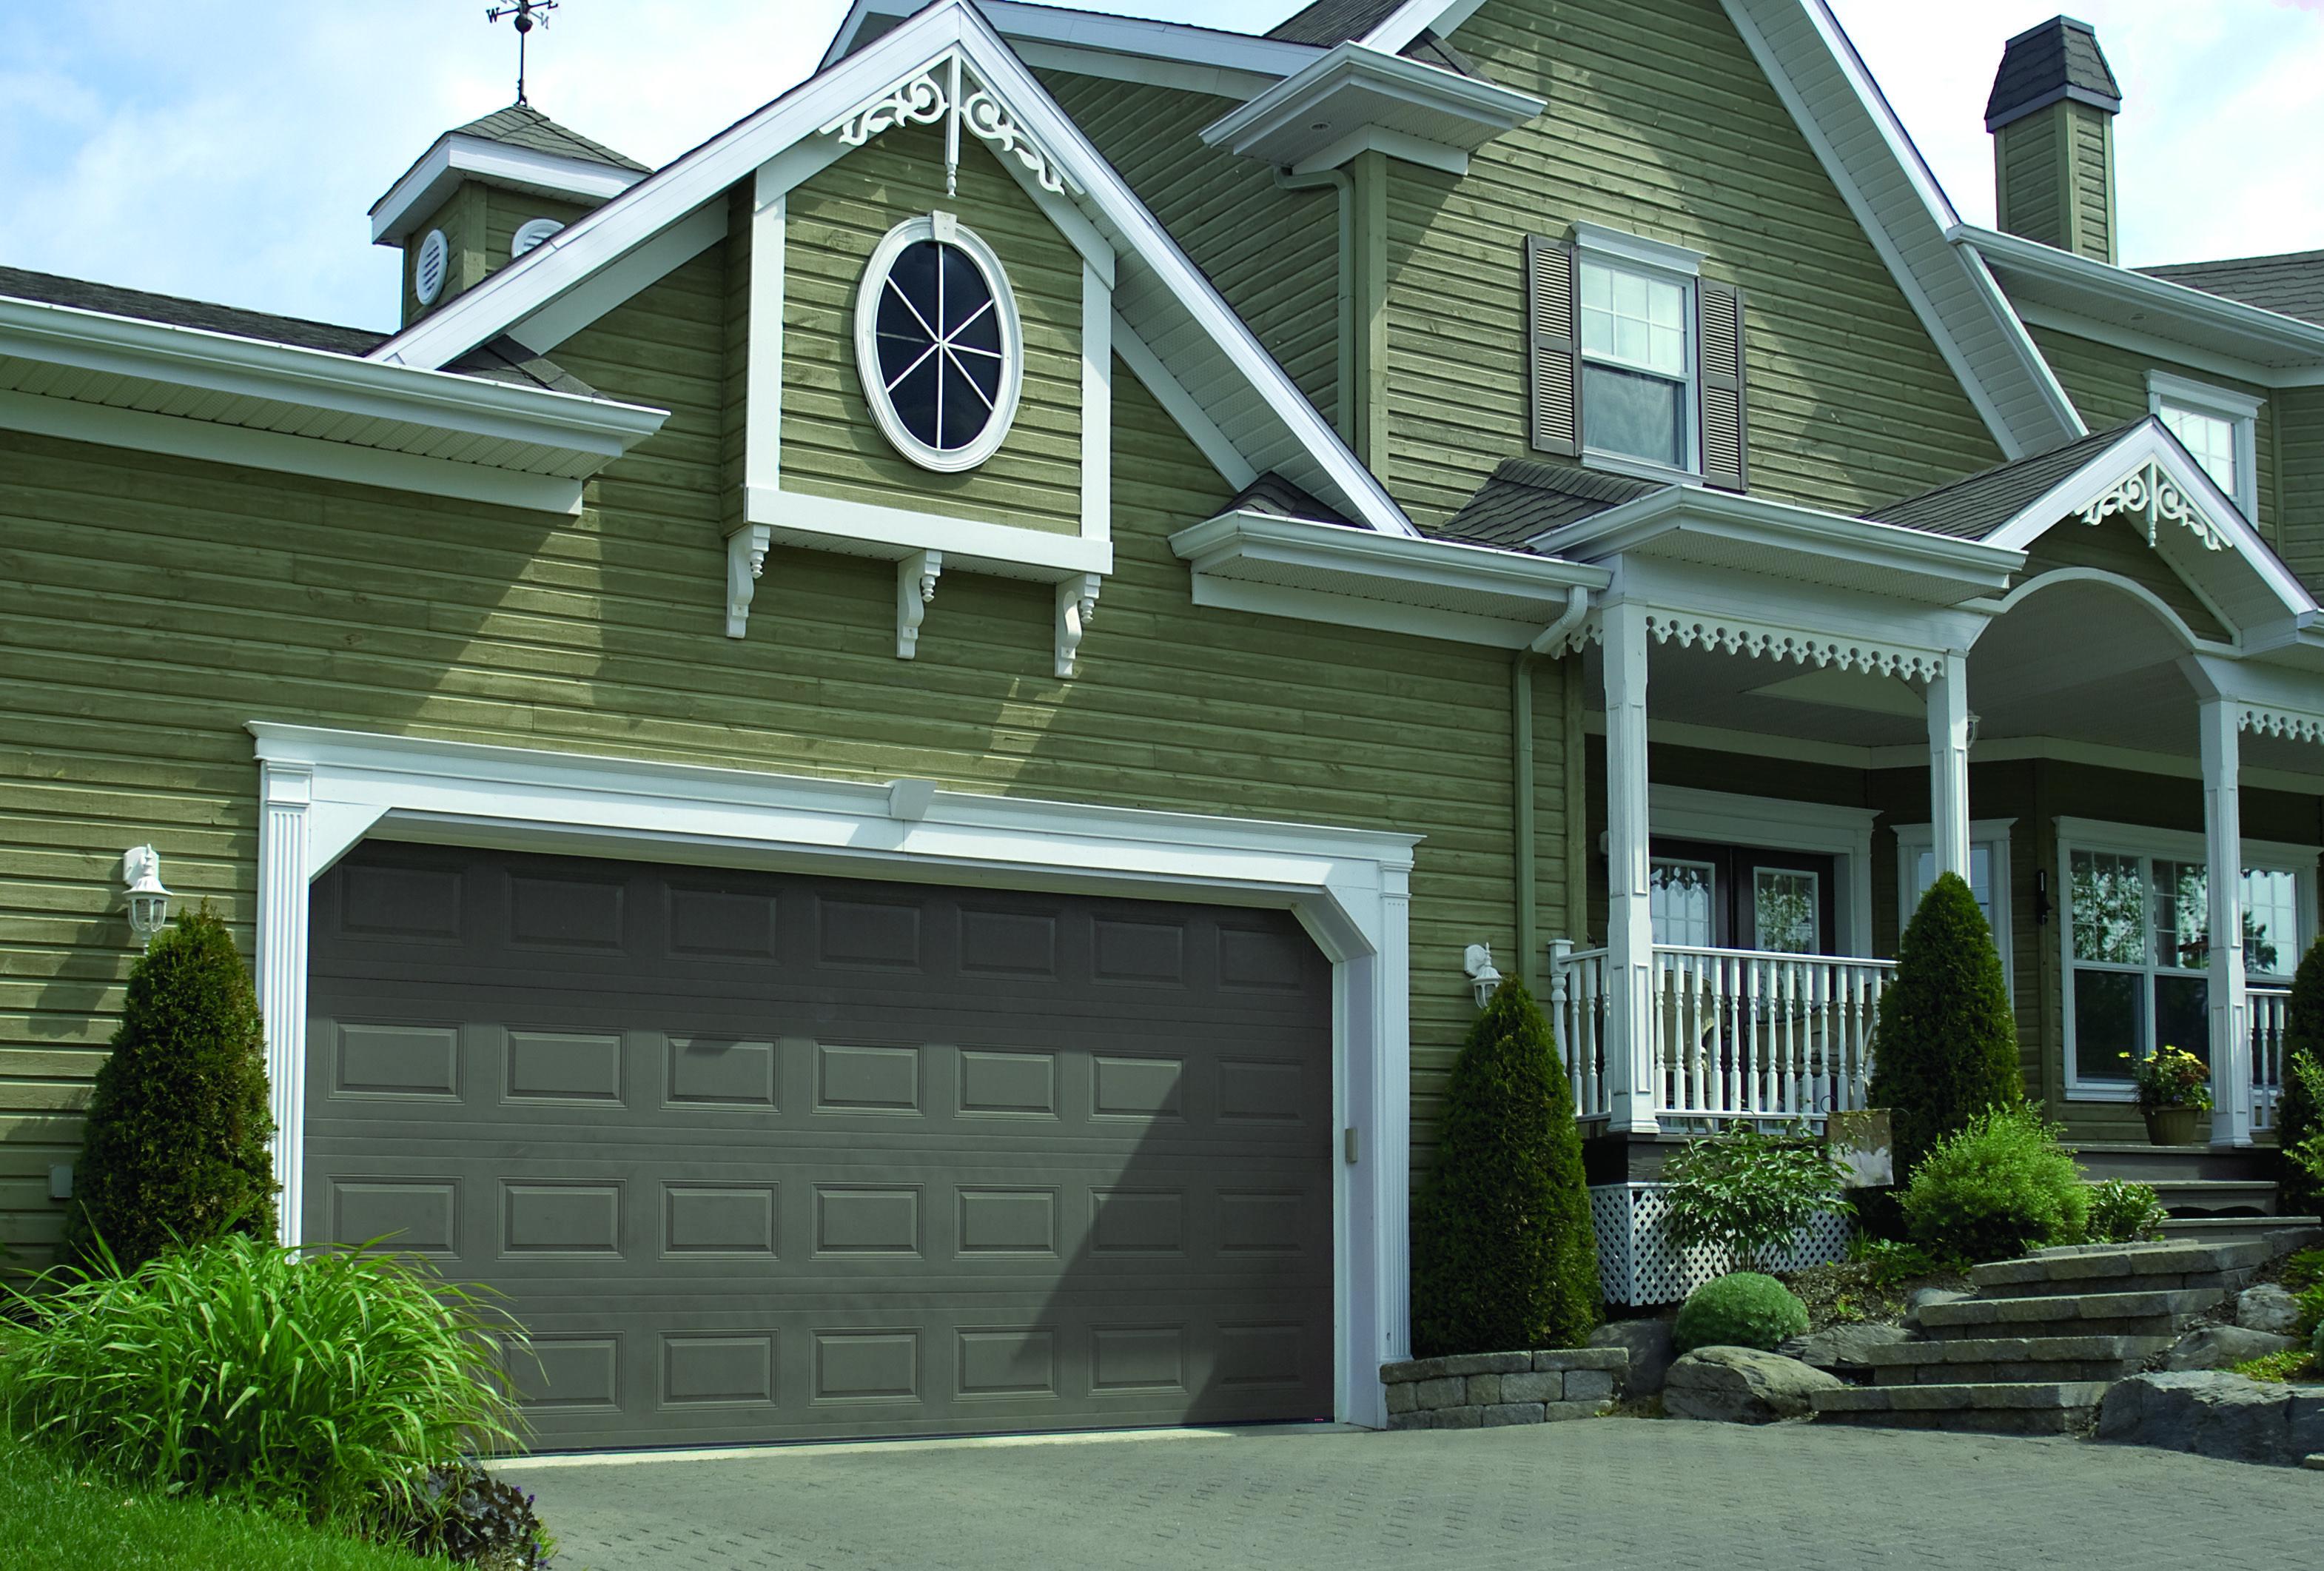 service opener overhead single oceanside size company full door large copy of garage